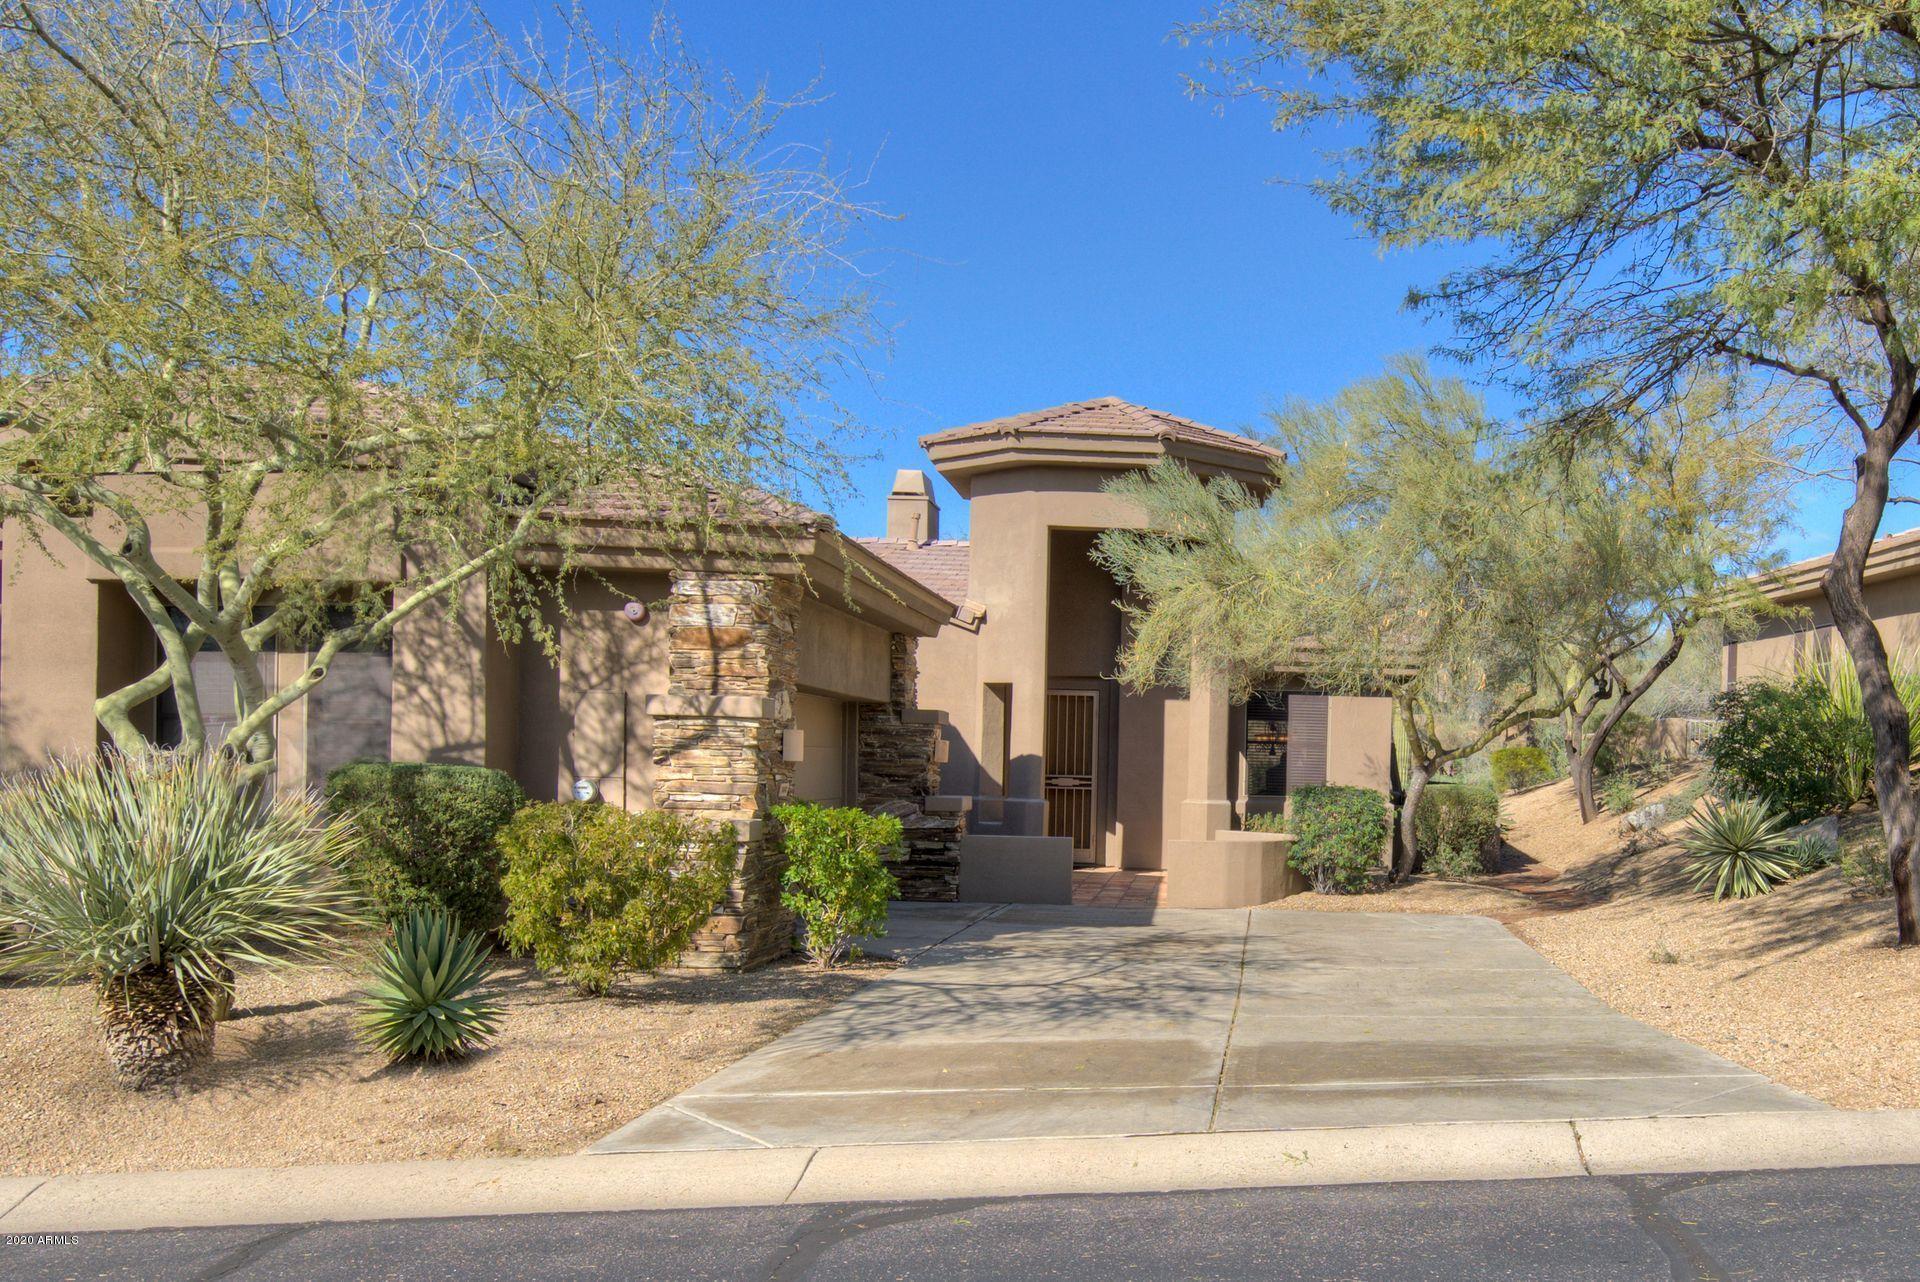 Photo of 7450 E QUIEN SABE Way, Scottsdale, AZ 85266